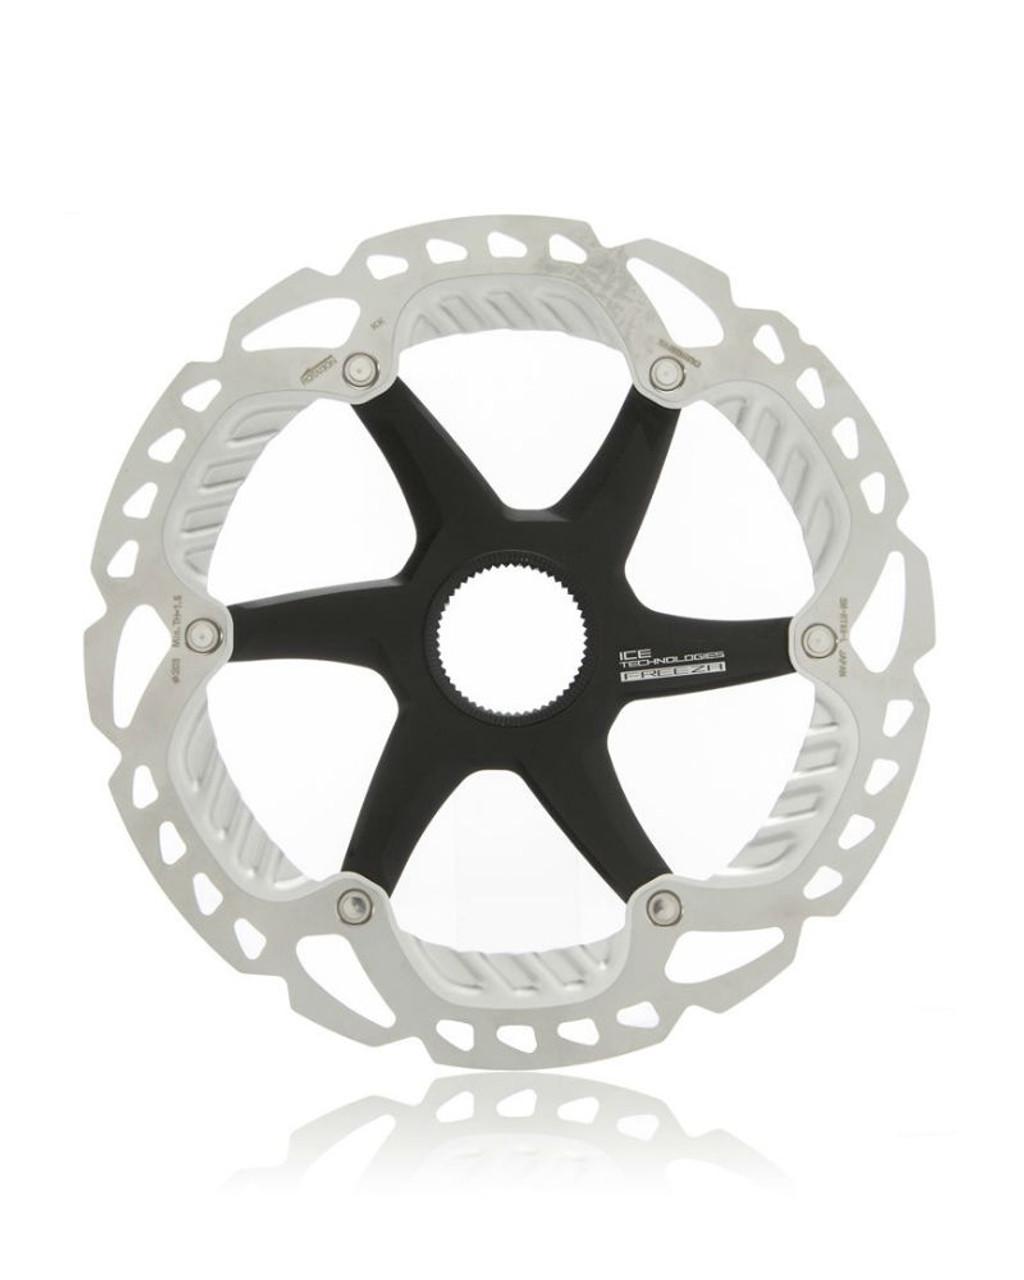 Sport Shimano Deore Xt Sm Rt800 S Disc Brake Rotor Centerlock 160mm Ice Technology Bremsscheiben Escxtra Com